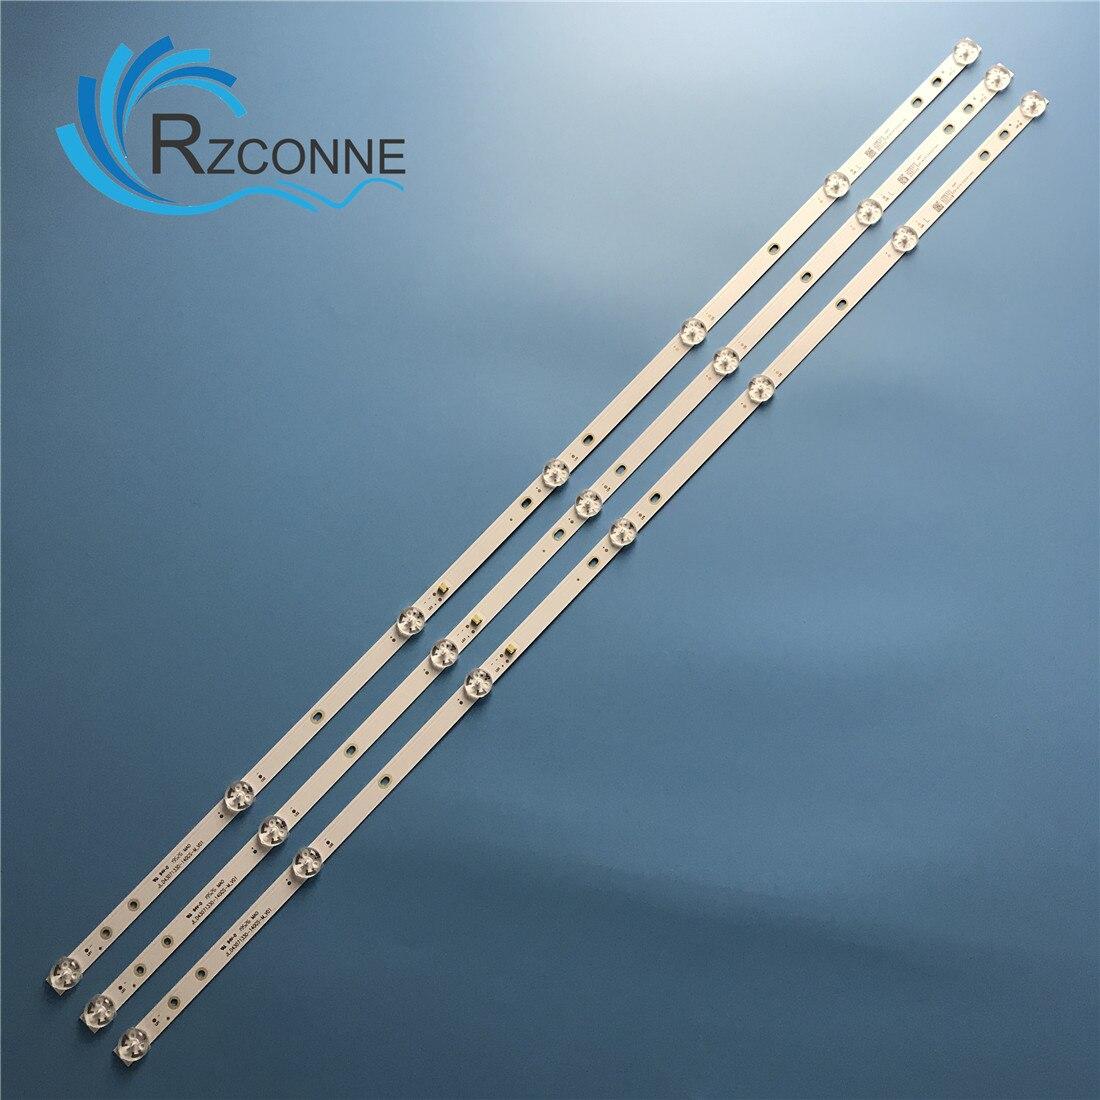 773mm-de-tira-de-led-para-iluminacion-trasera-7-lampara-para-jld43071330-140gs-m_v01